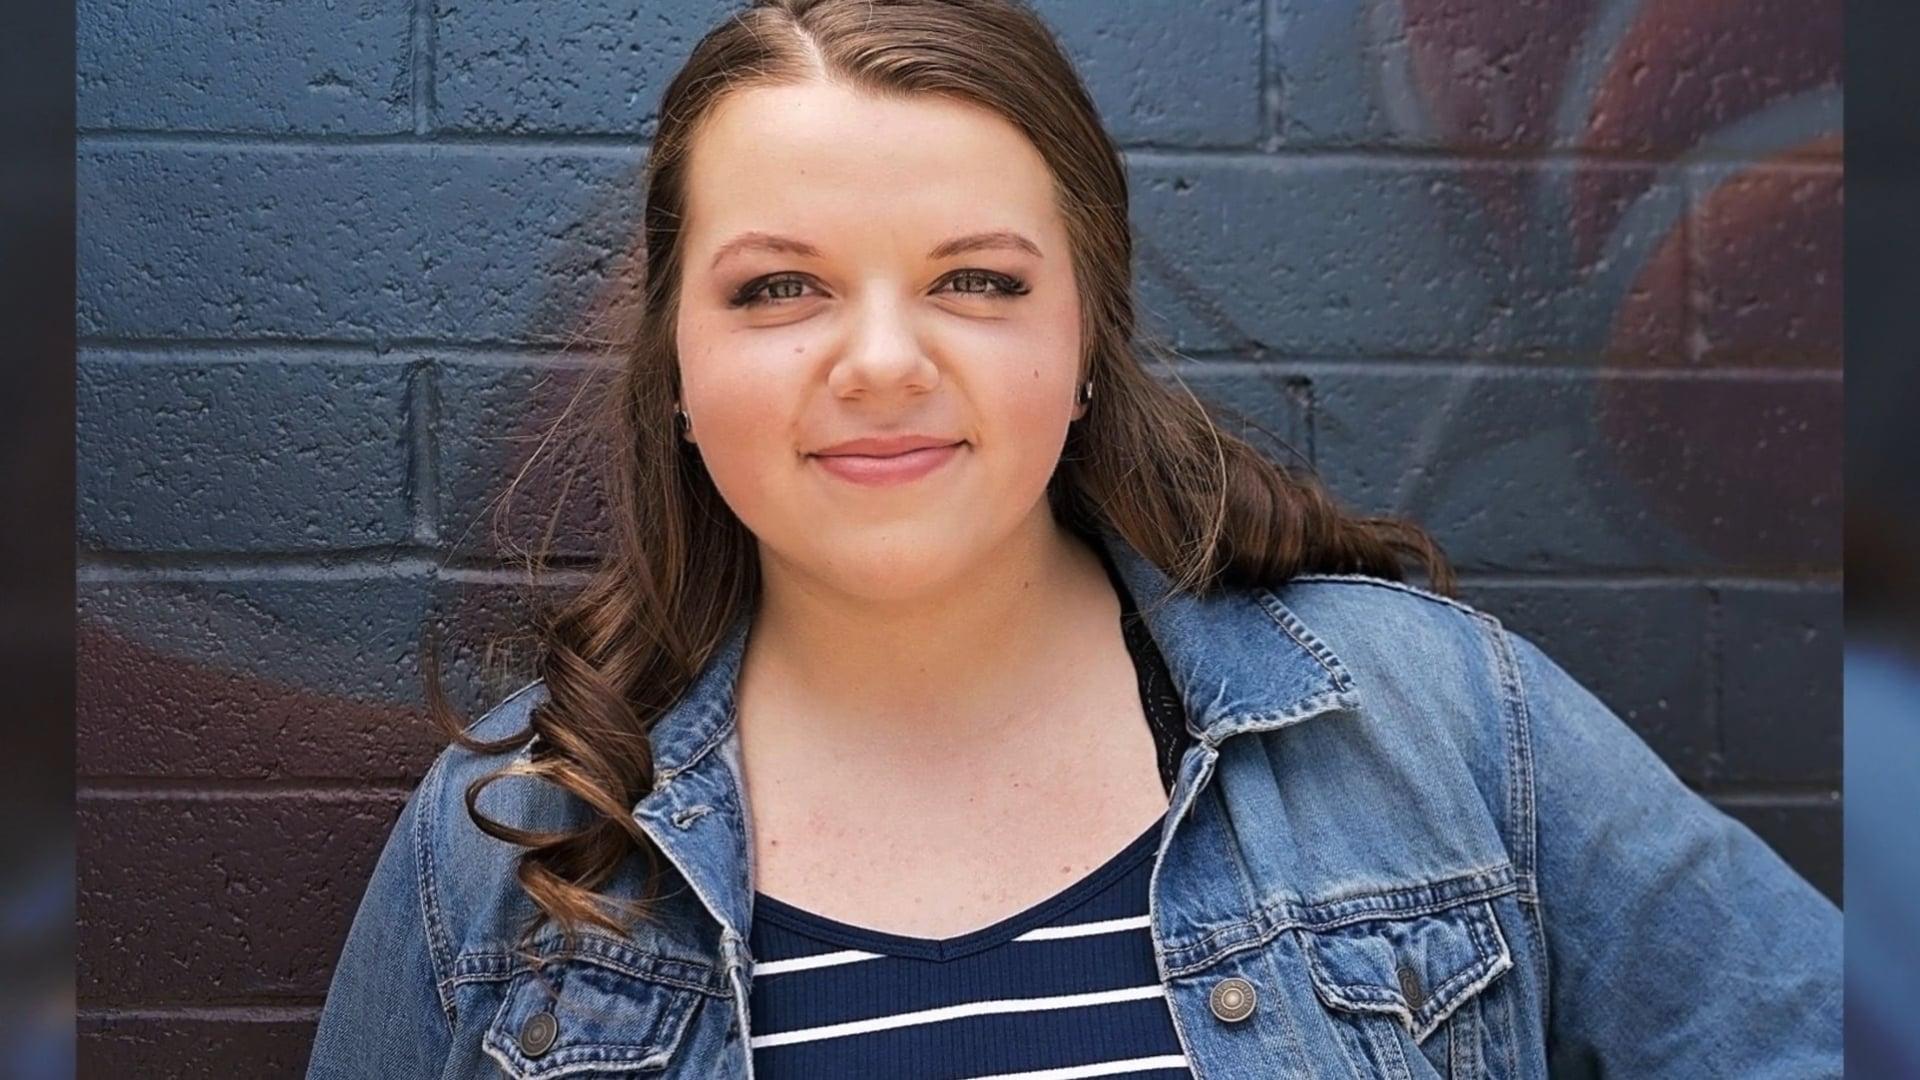 Madison's Senior Portraits